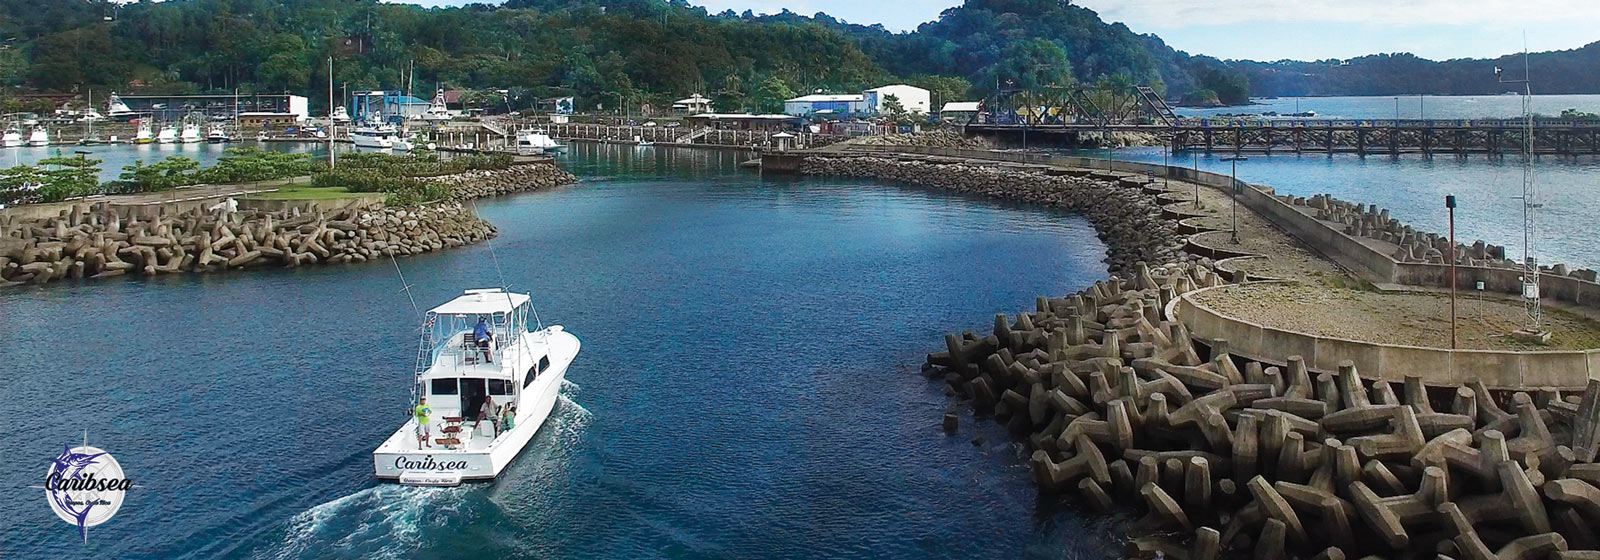 Caribsea Quepos sportfishing charter: entering marina back left